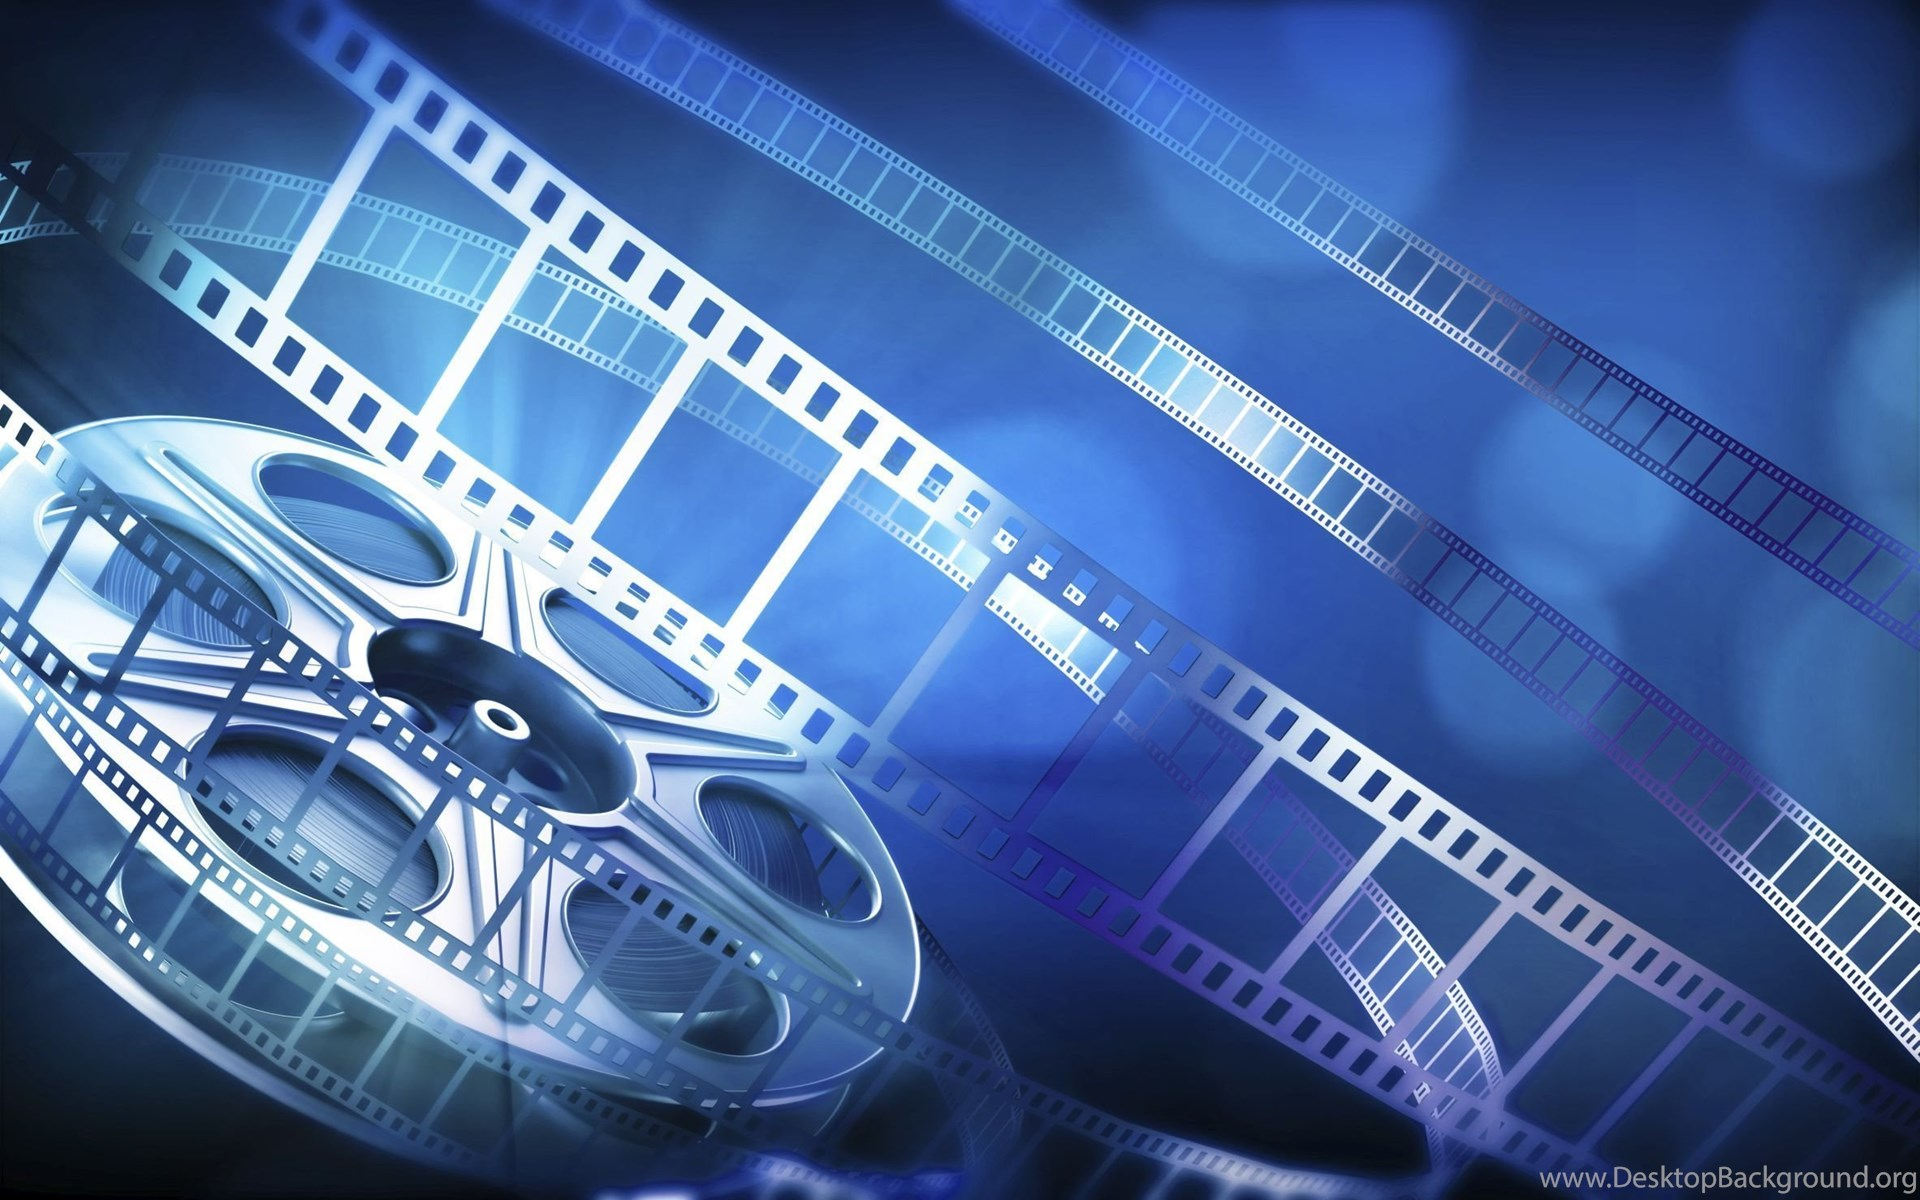 Movie theater wallpapers desktop background widescreen voltagebd Choice Image